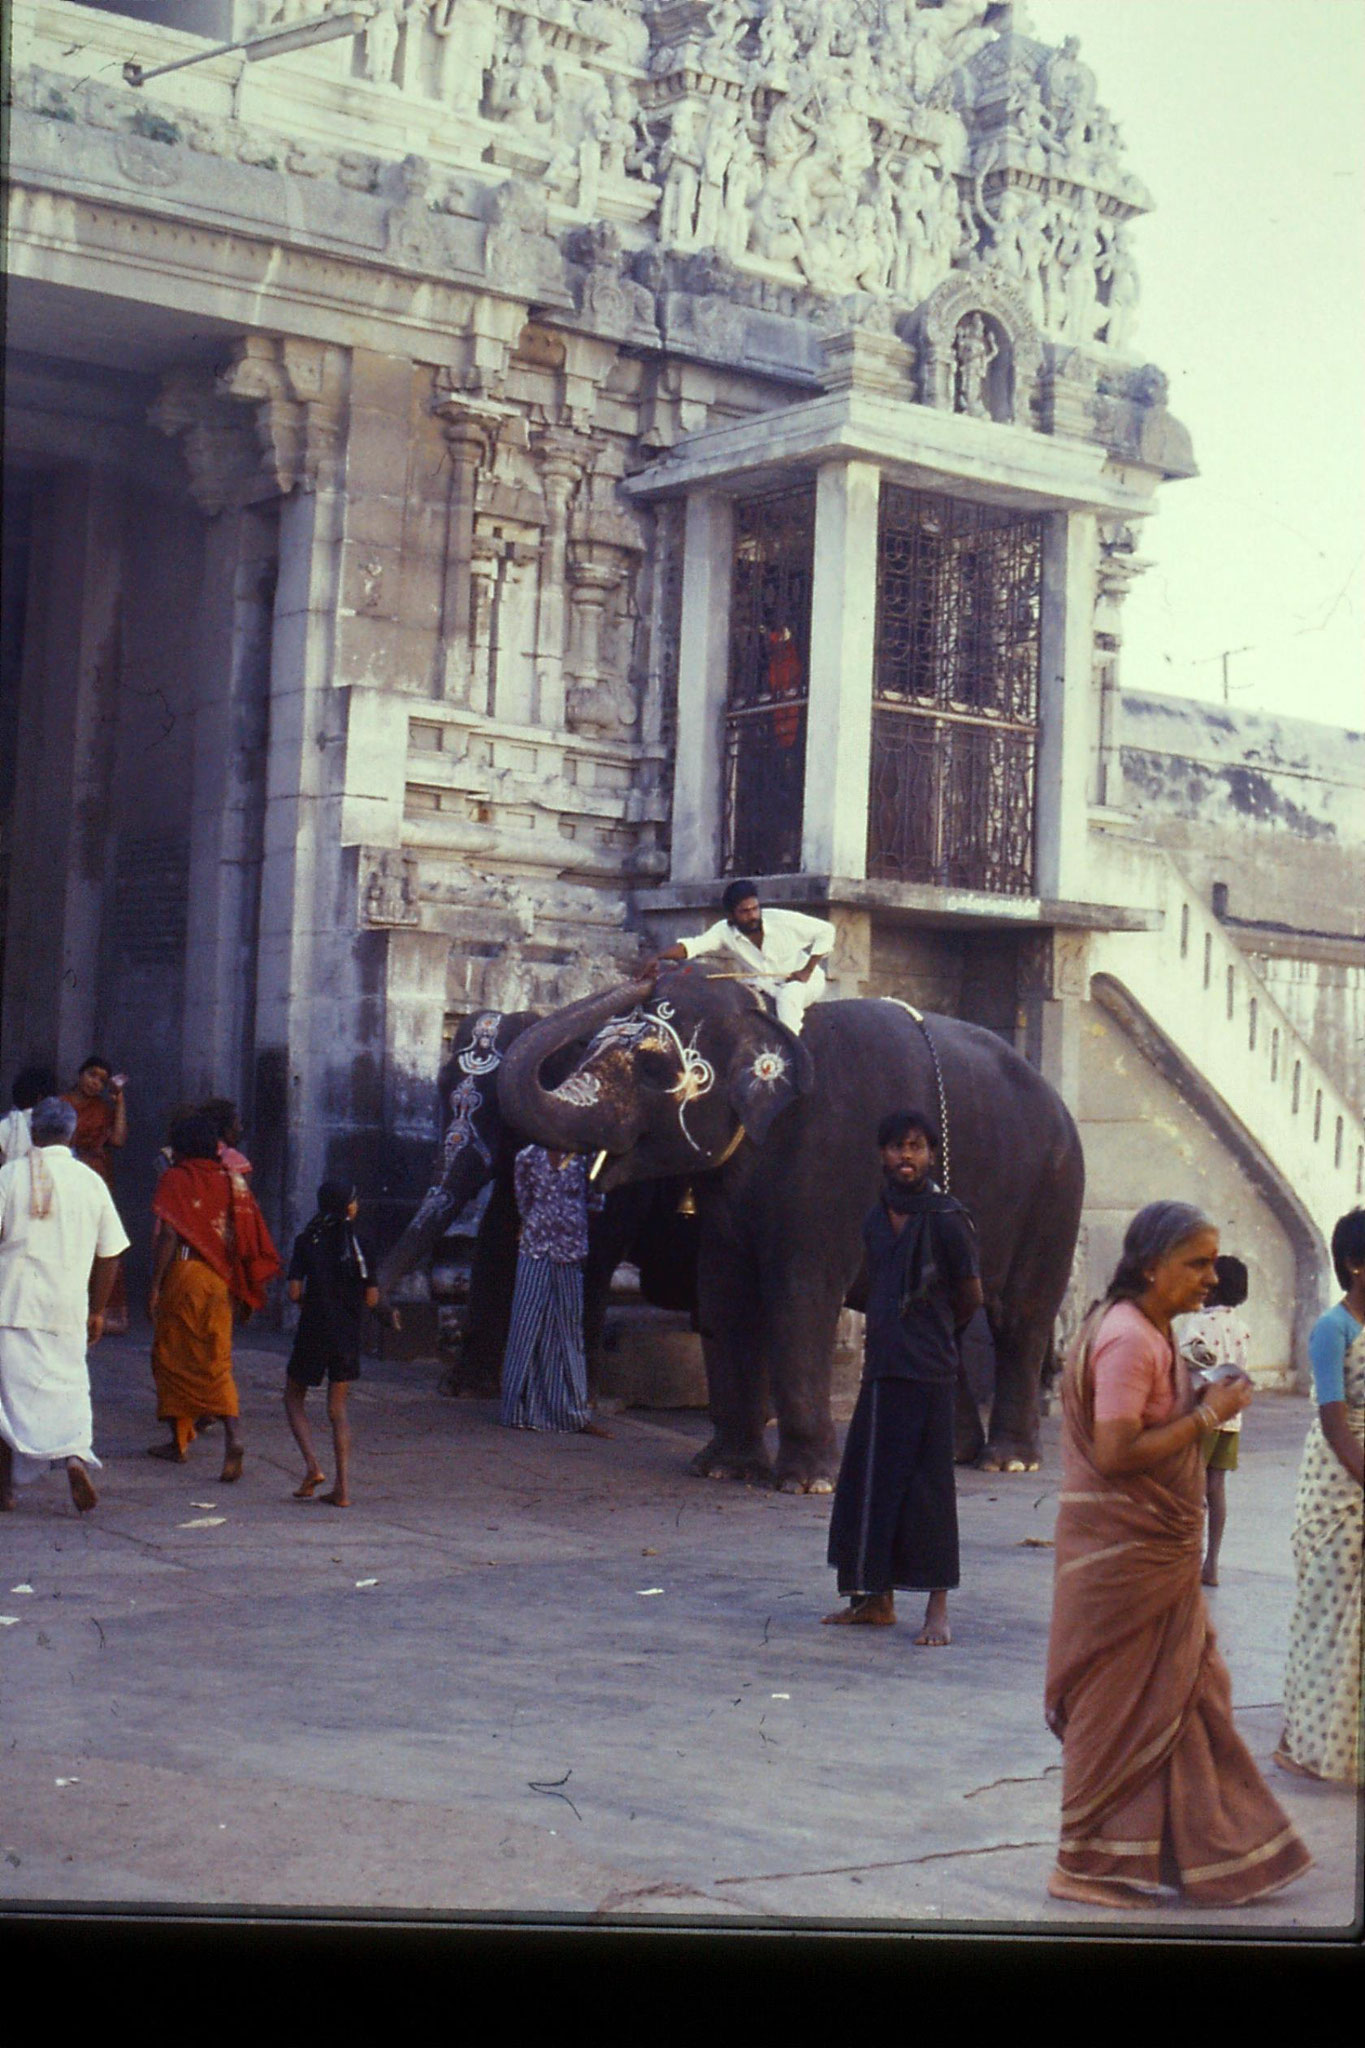 19/1/1990: 16: Kamakshi temple, elephant collecting money